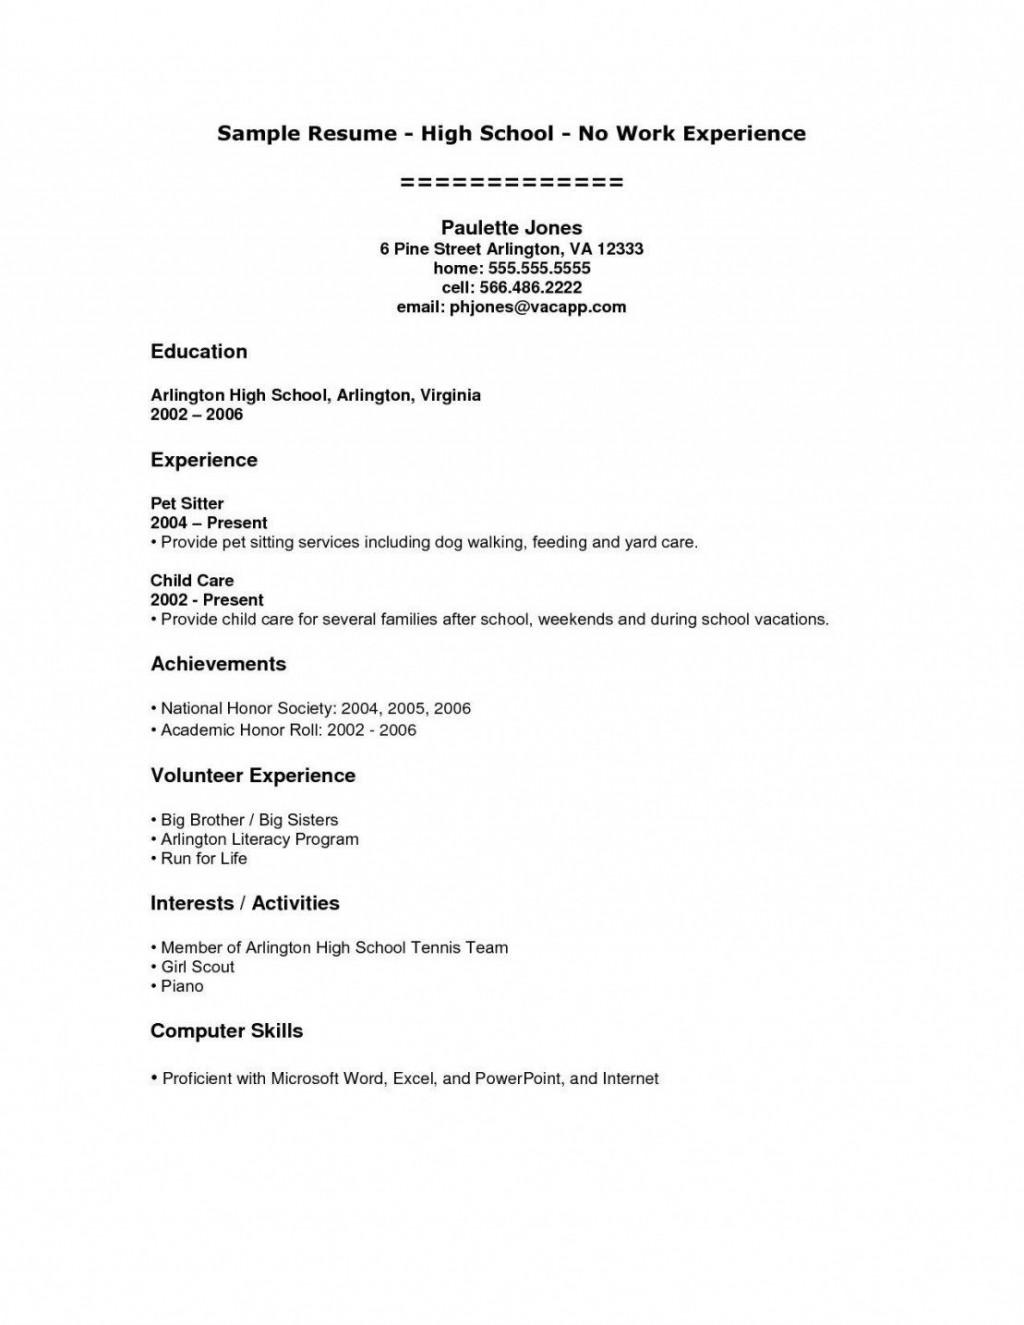 008 Shocking High School Student Resume Template Inspiration  Free Microsoft Word 2010Large